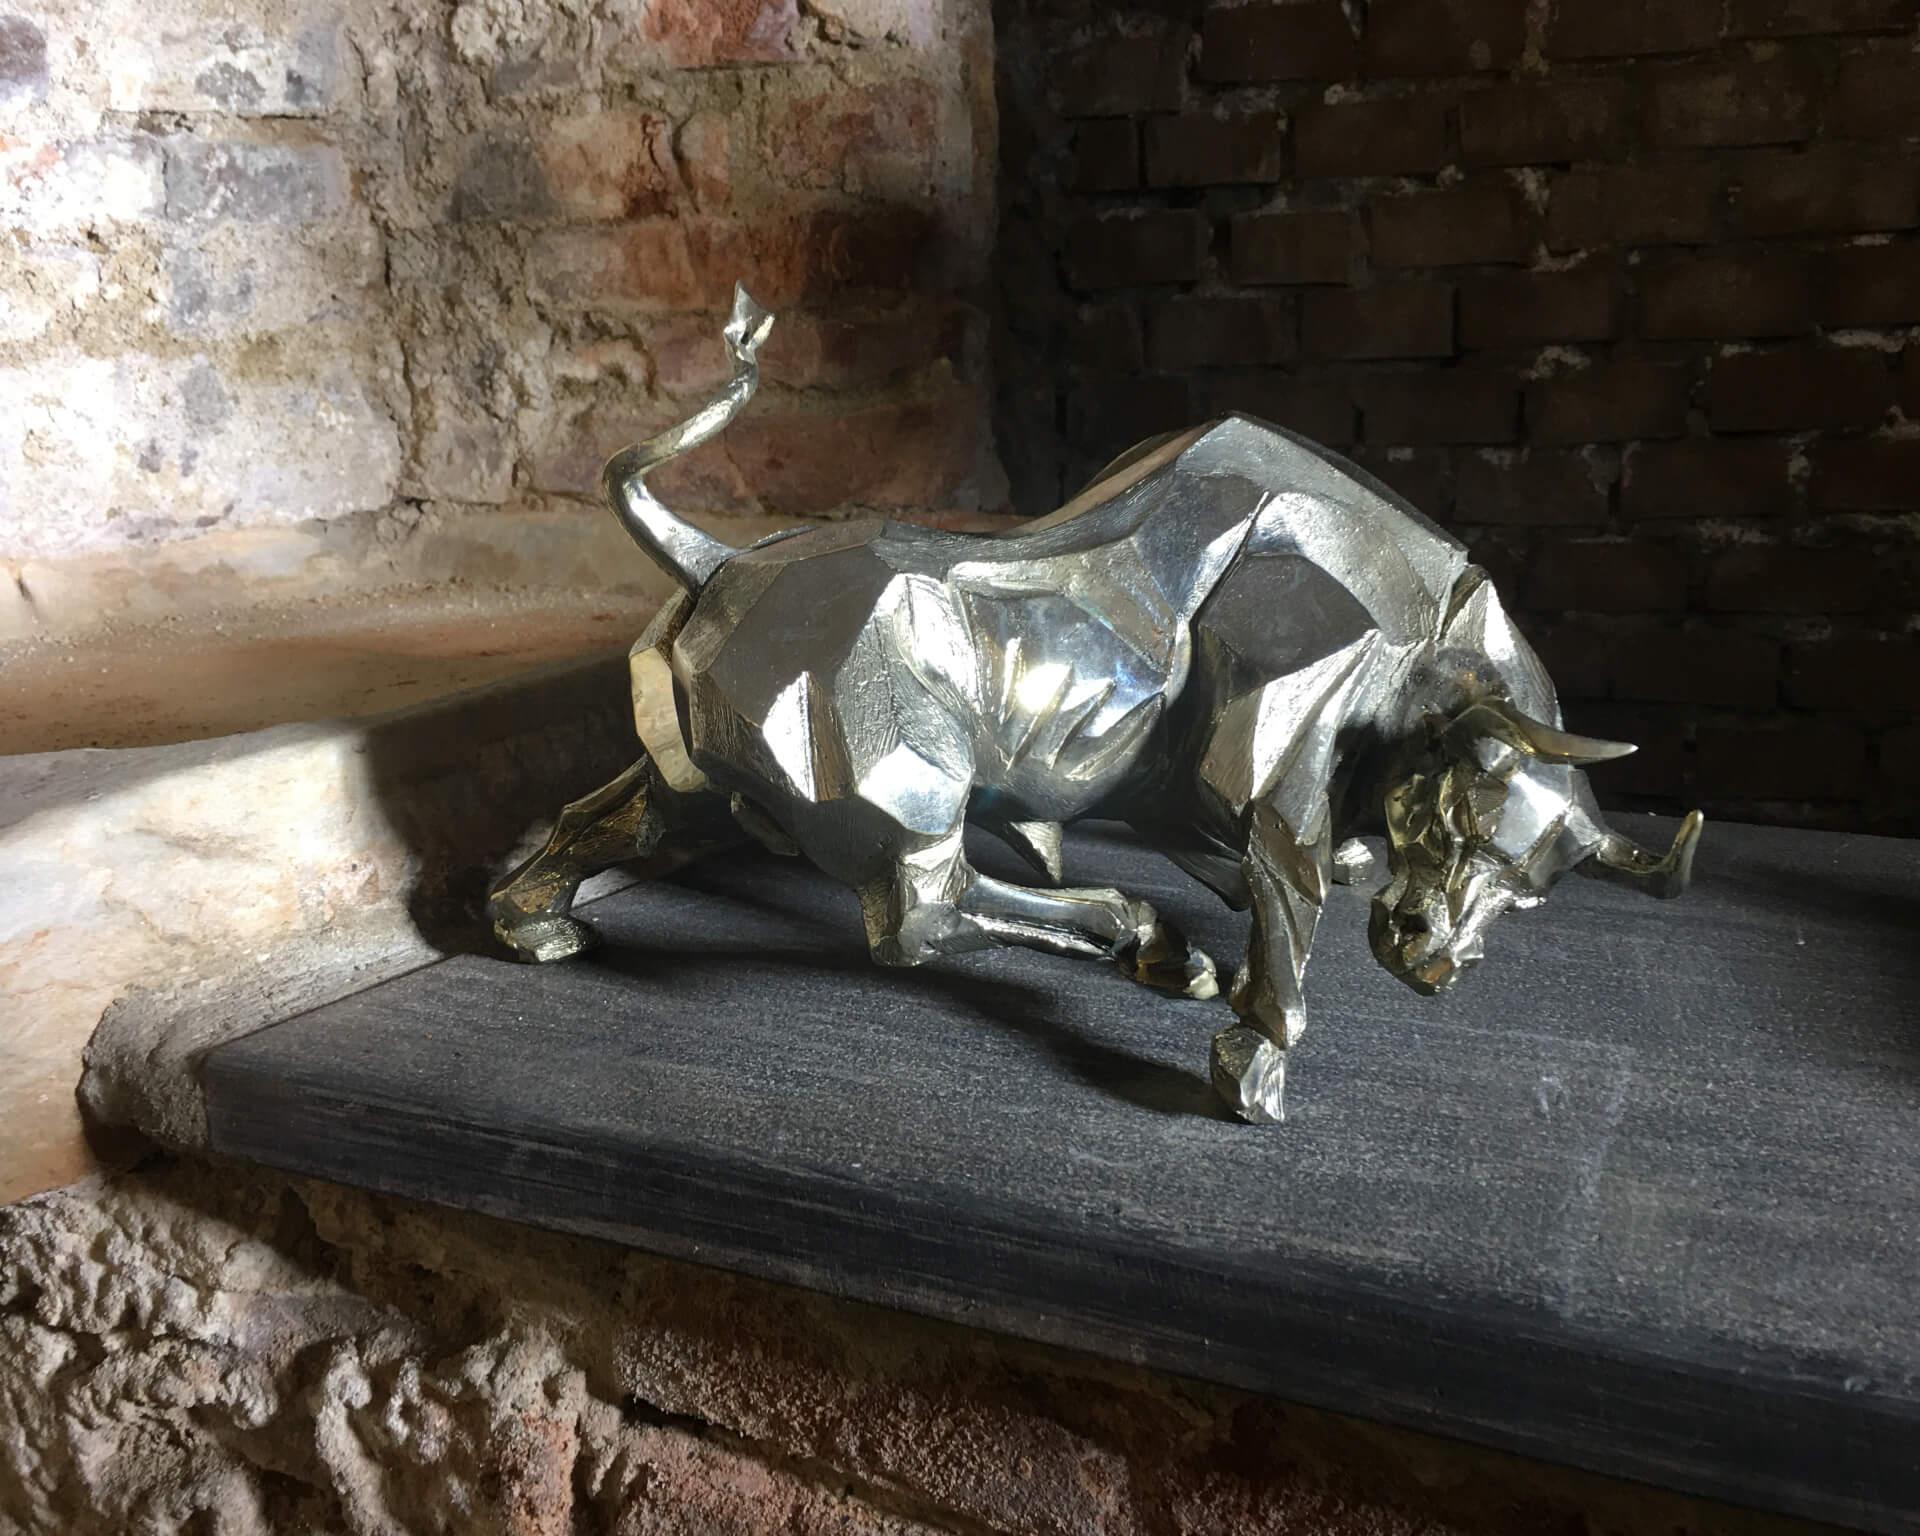 laura tartarelli contemporary art pietrasanta toro di sabrina ferrari